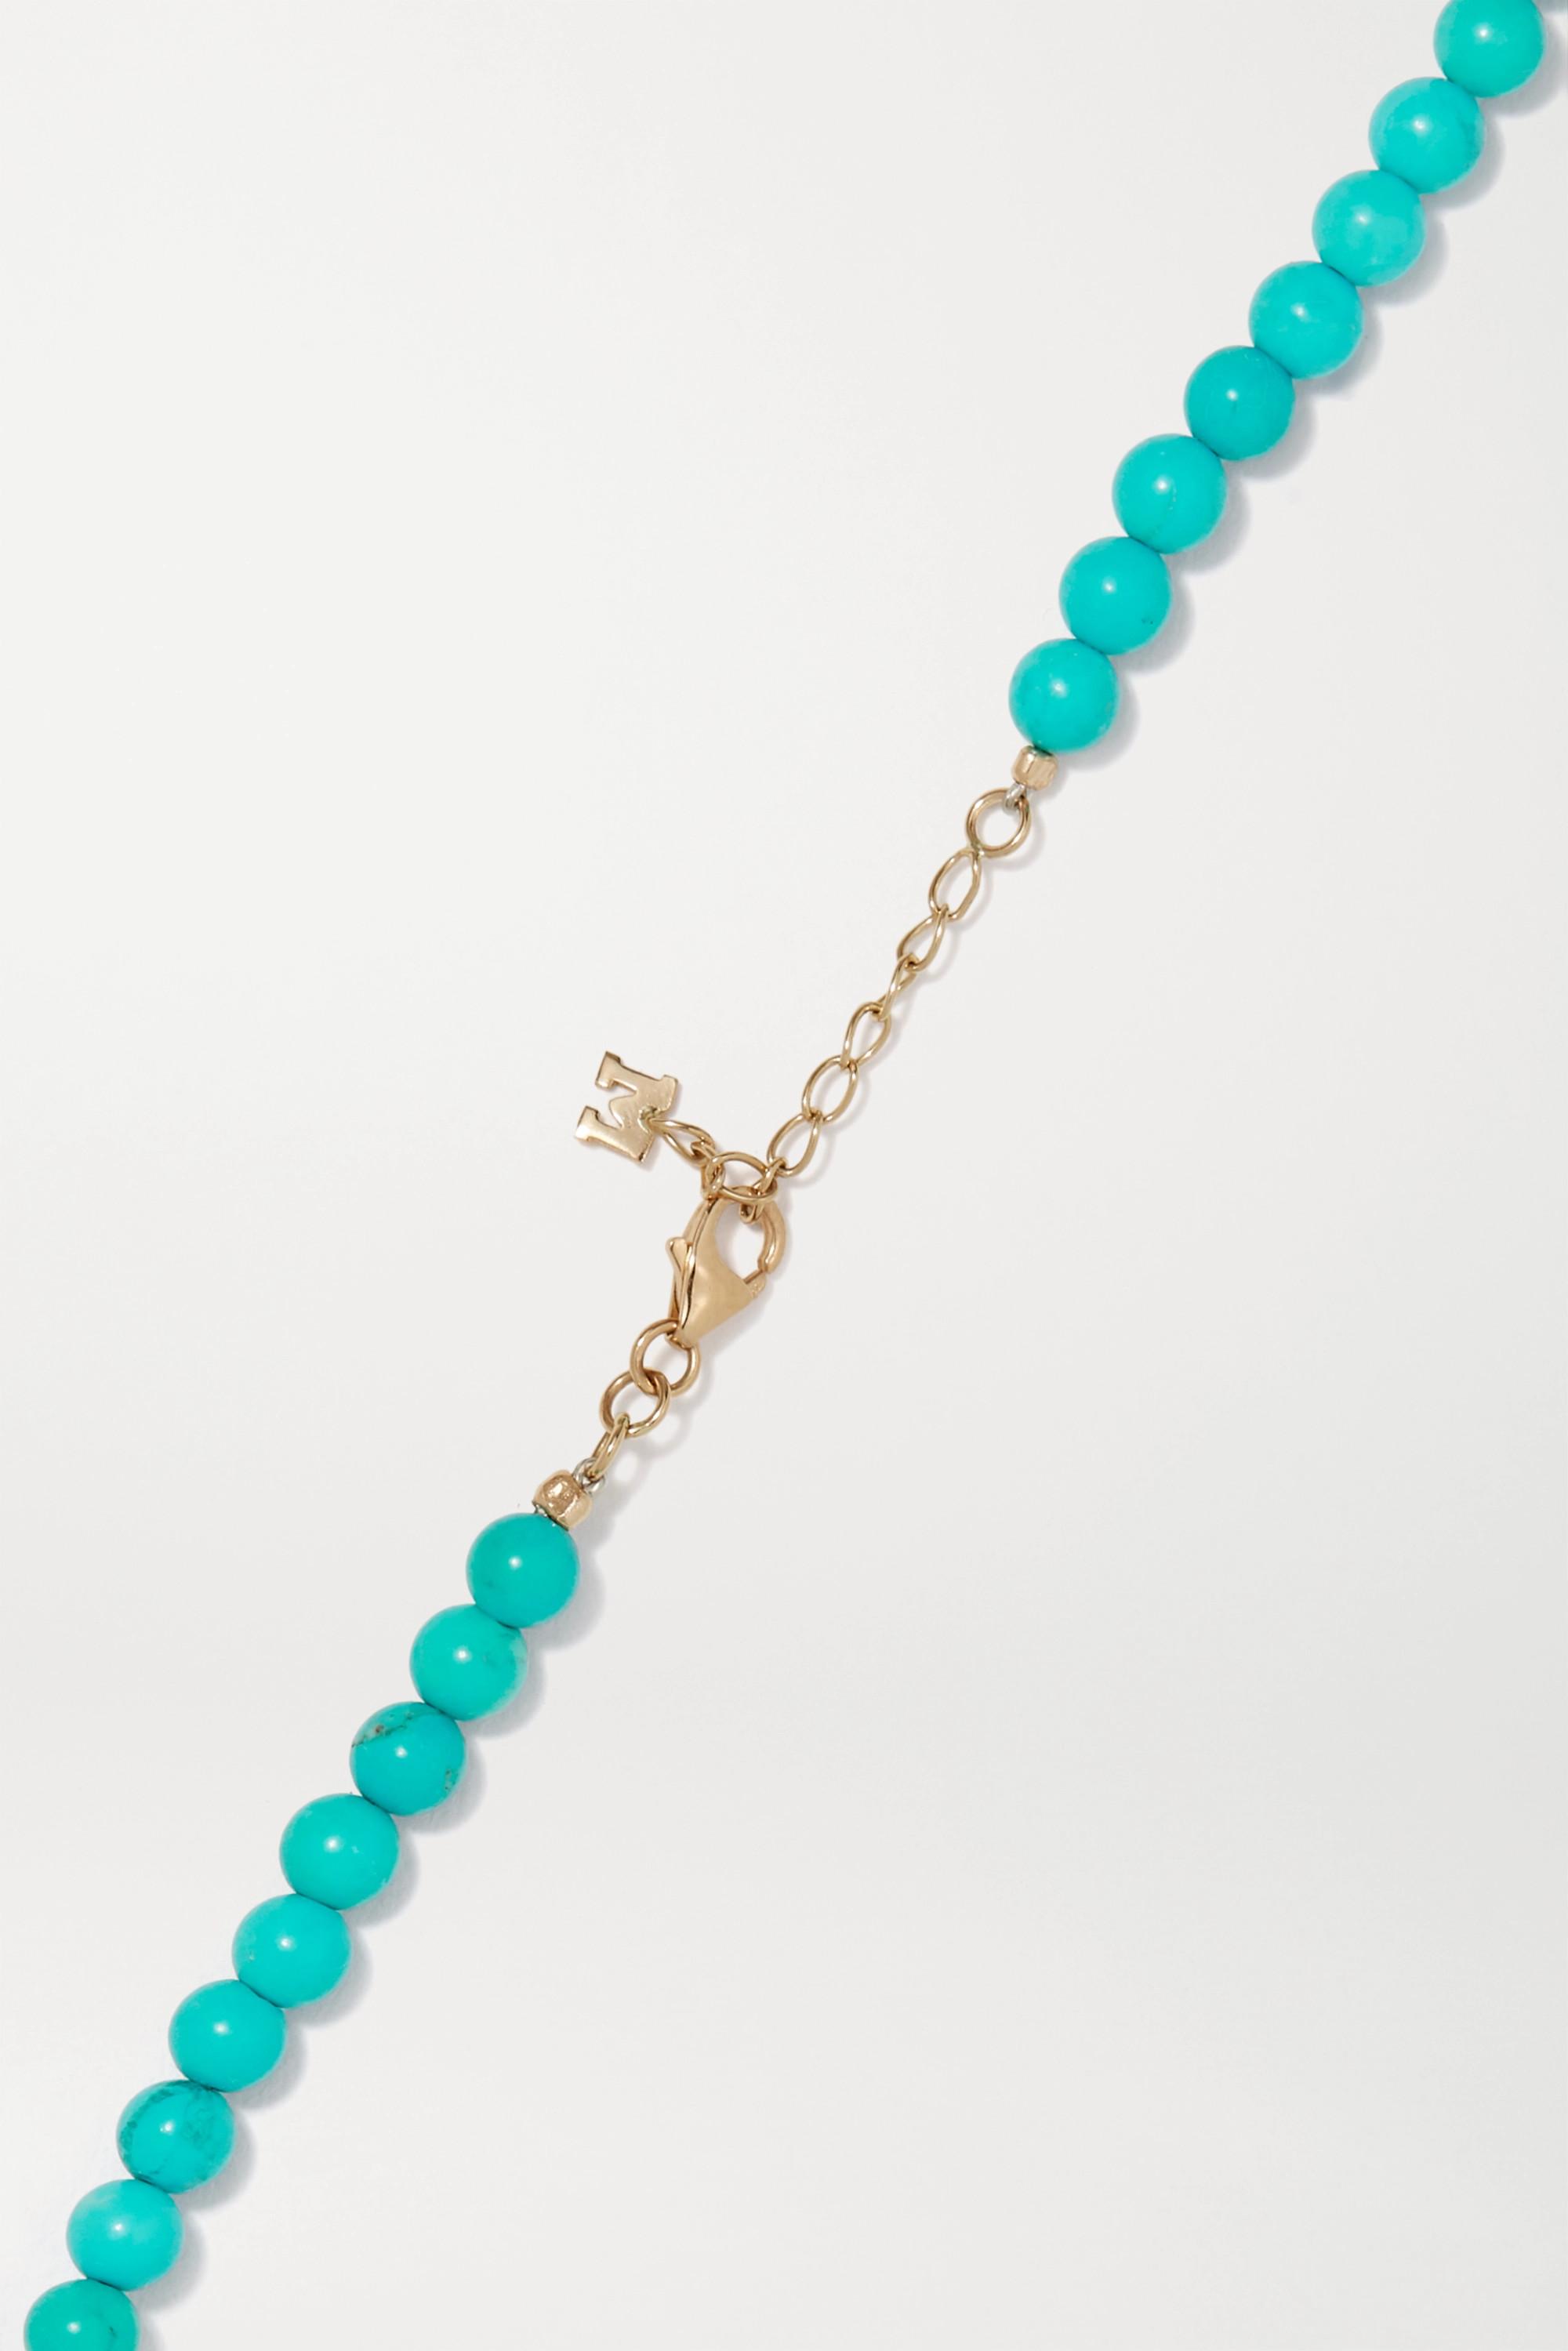 Mateo 14-karat gold, turquoise and pearl choker